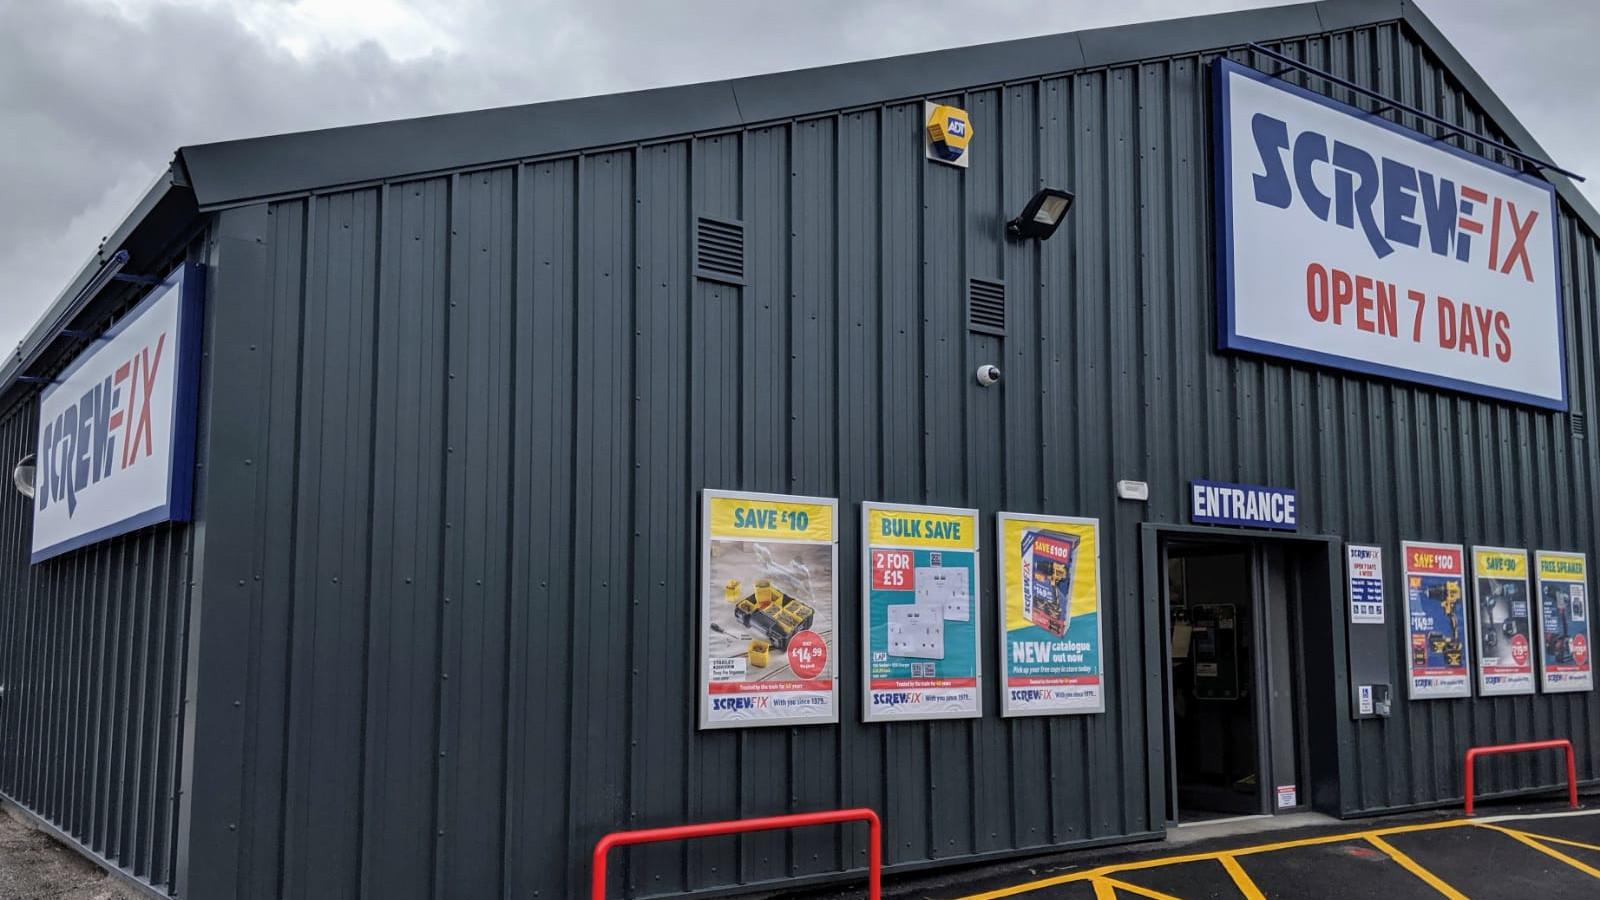 Oban celebrates new Screwfix store opening